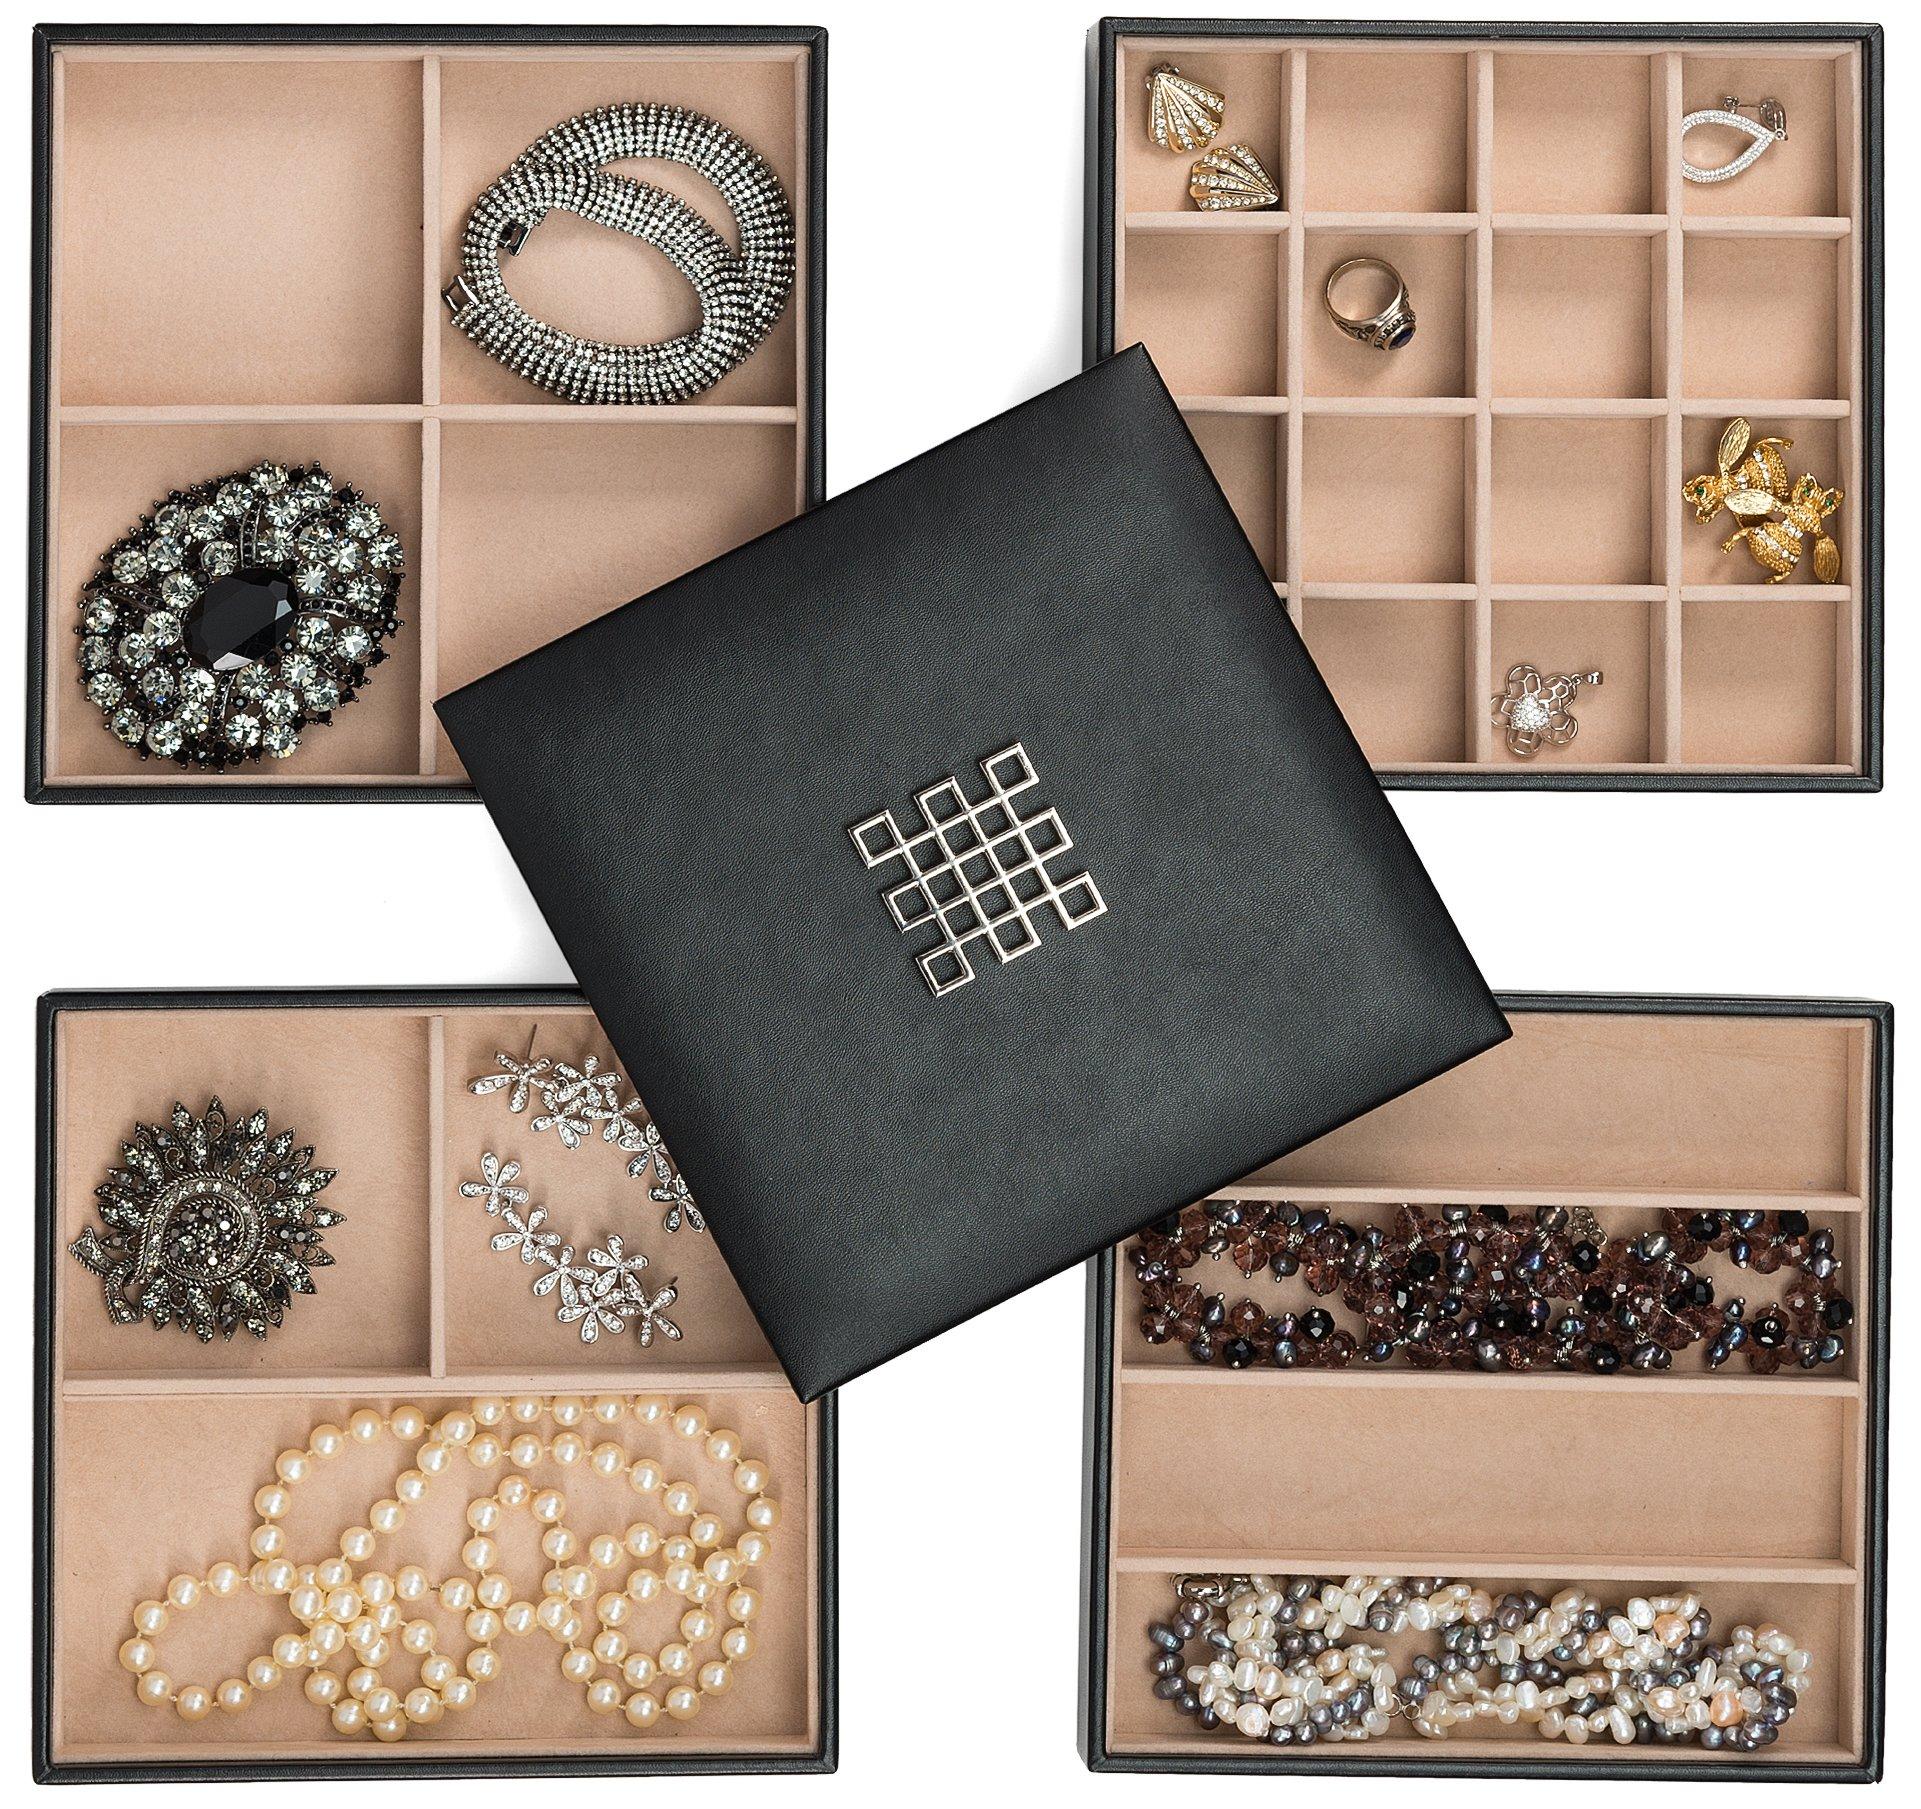 Glenor Co Jewelry Organizer Tray - 4 Stackable Trays & Lid Mirror - 27 Slot Storage Drawer, Dresser - Black